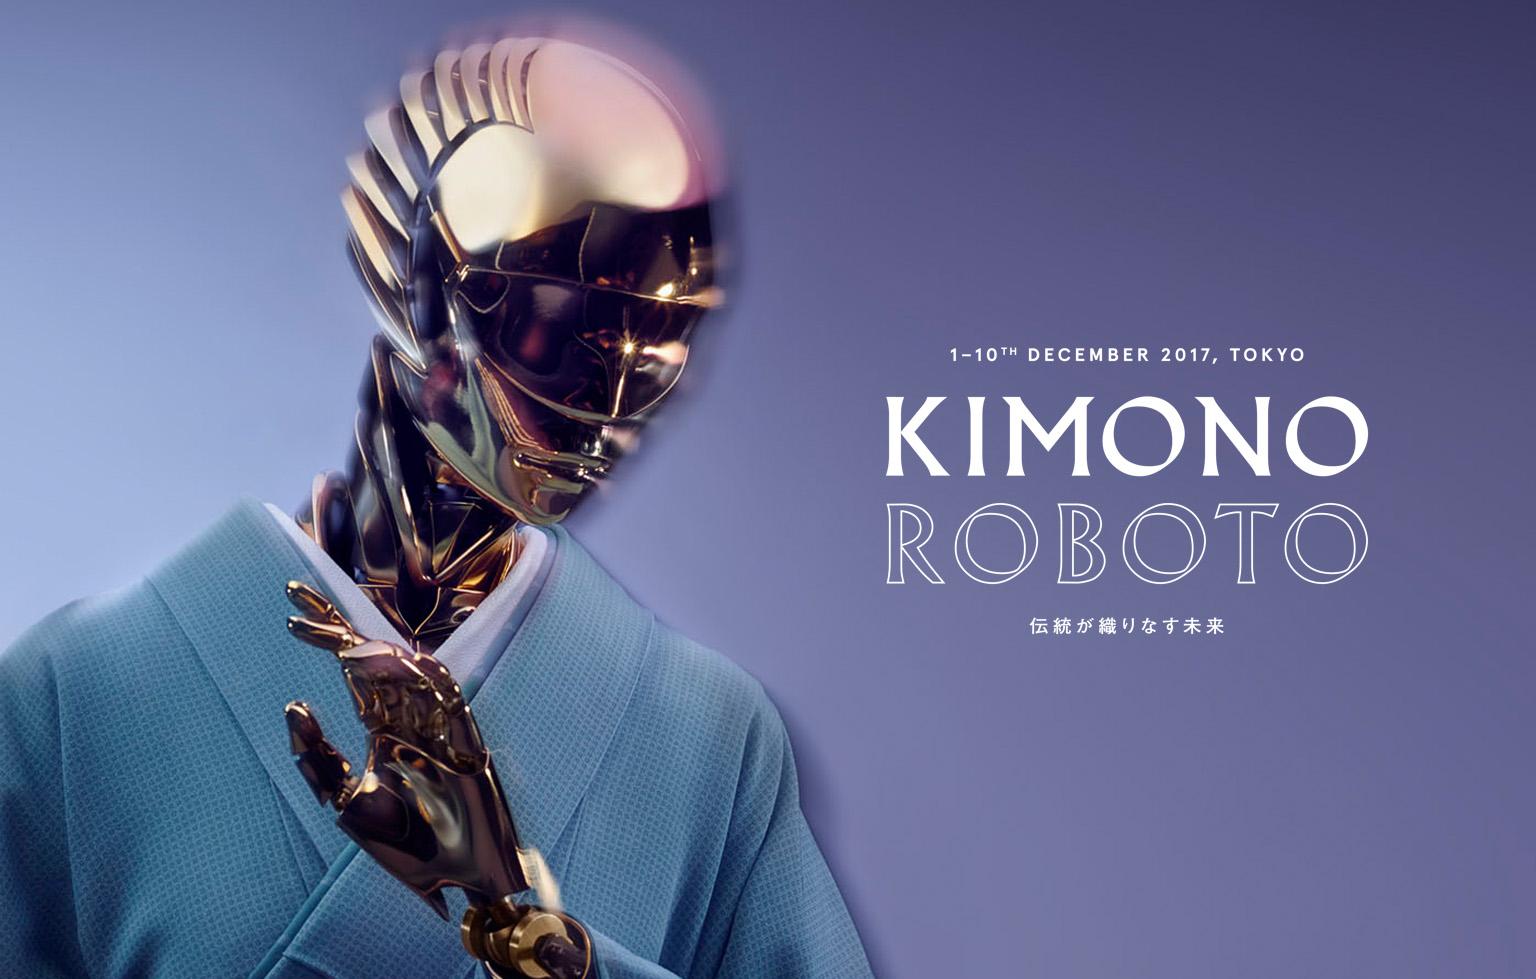 KimonoRoboto_posters 4